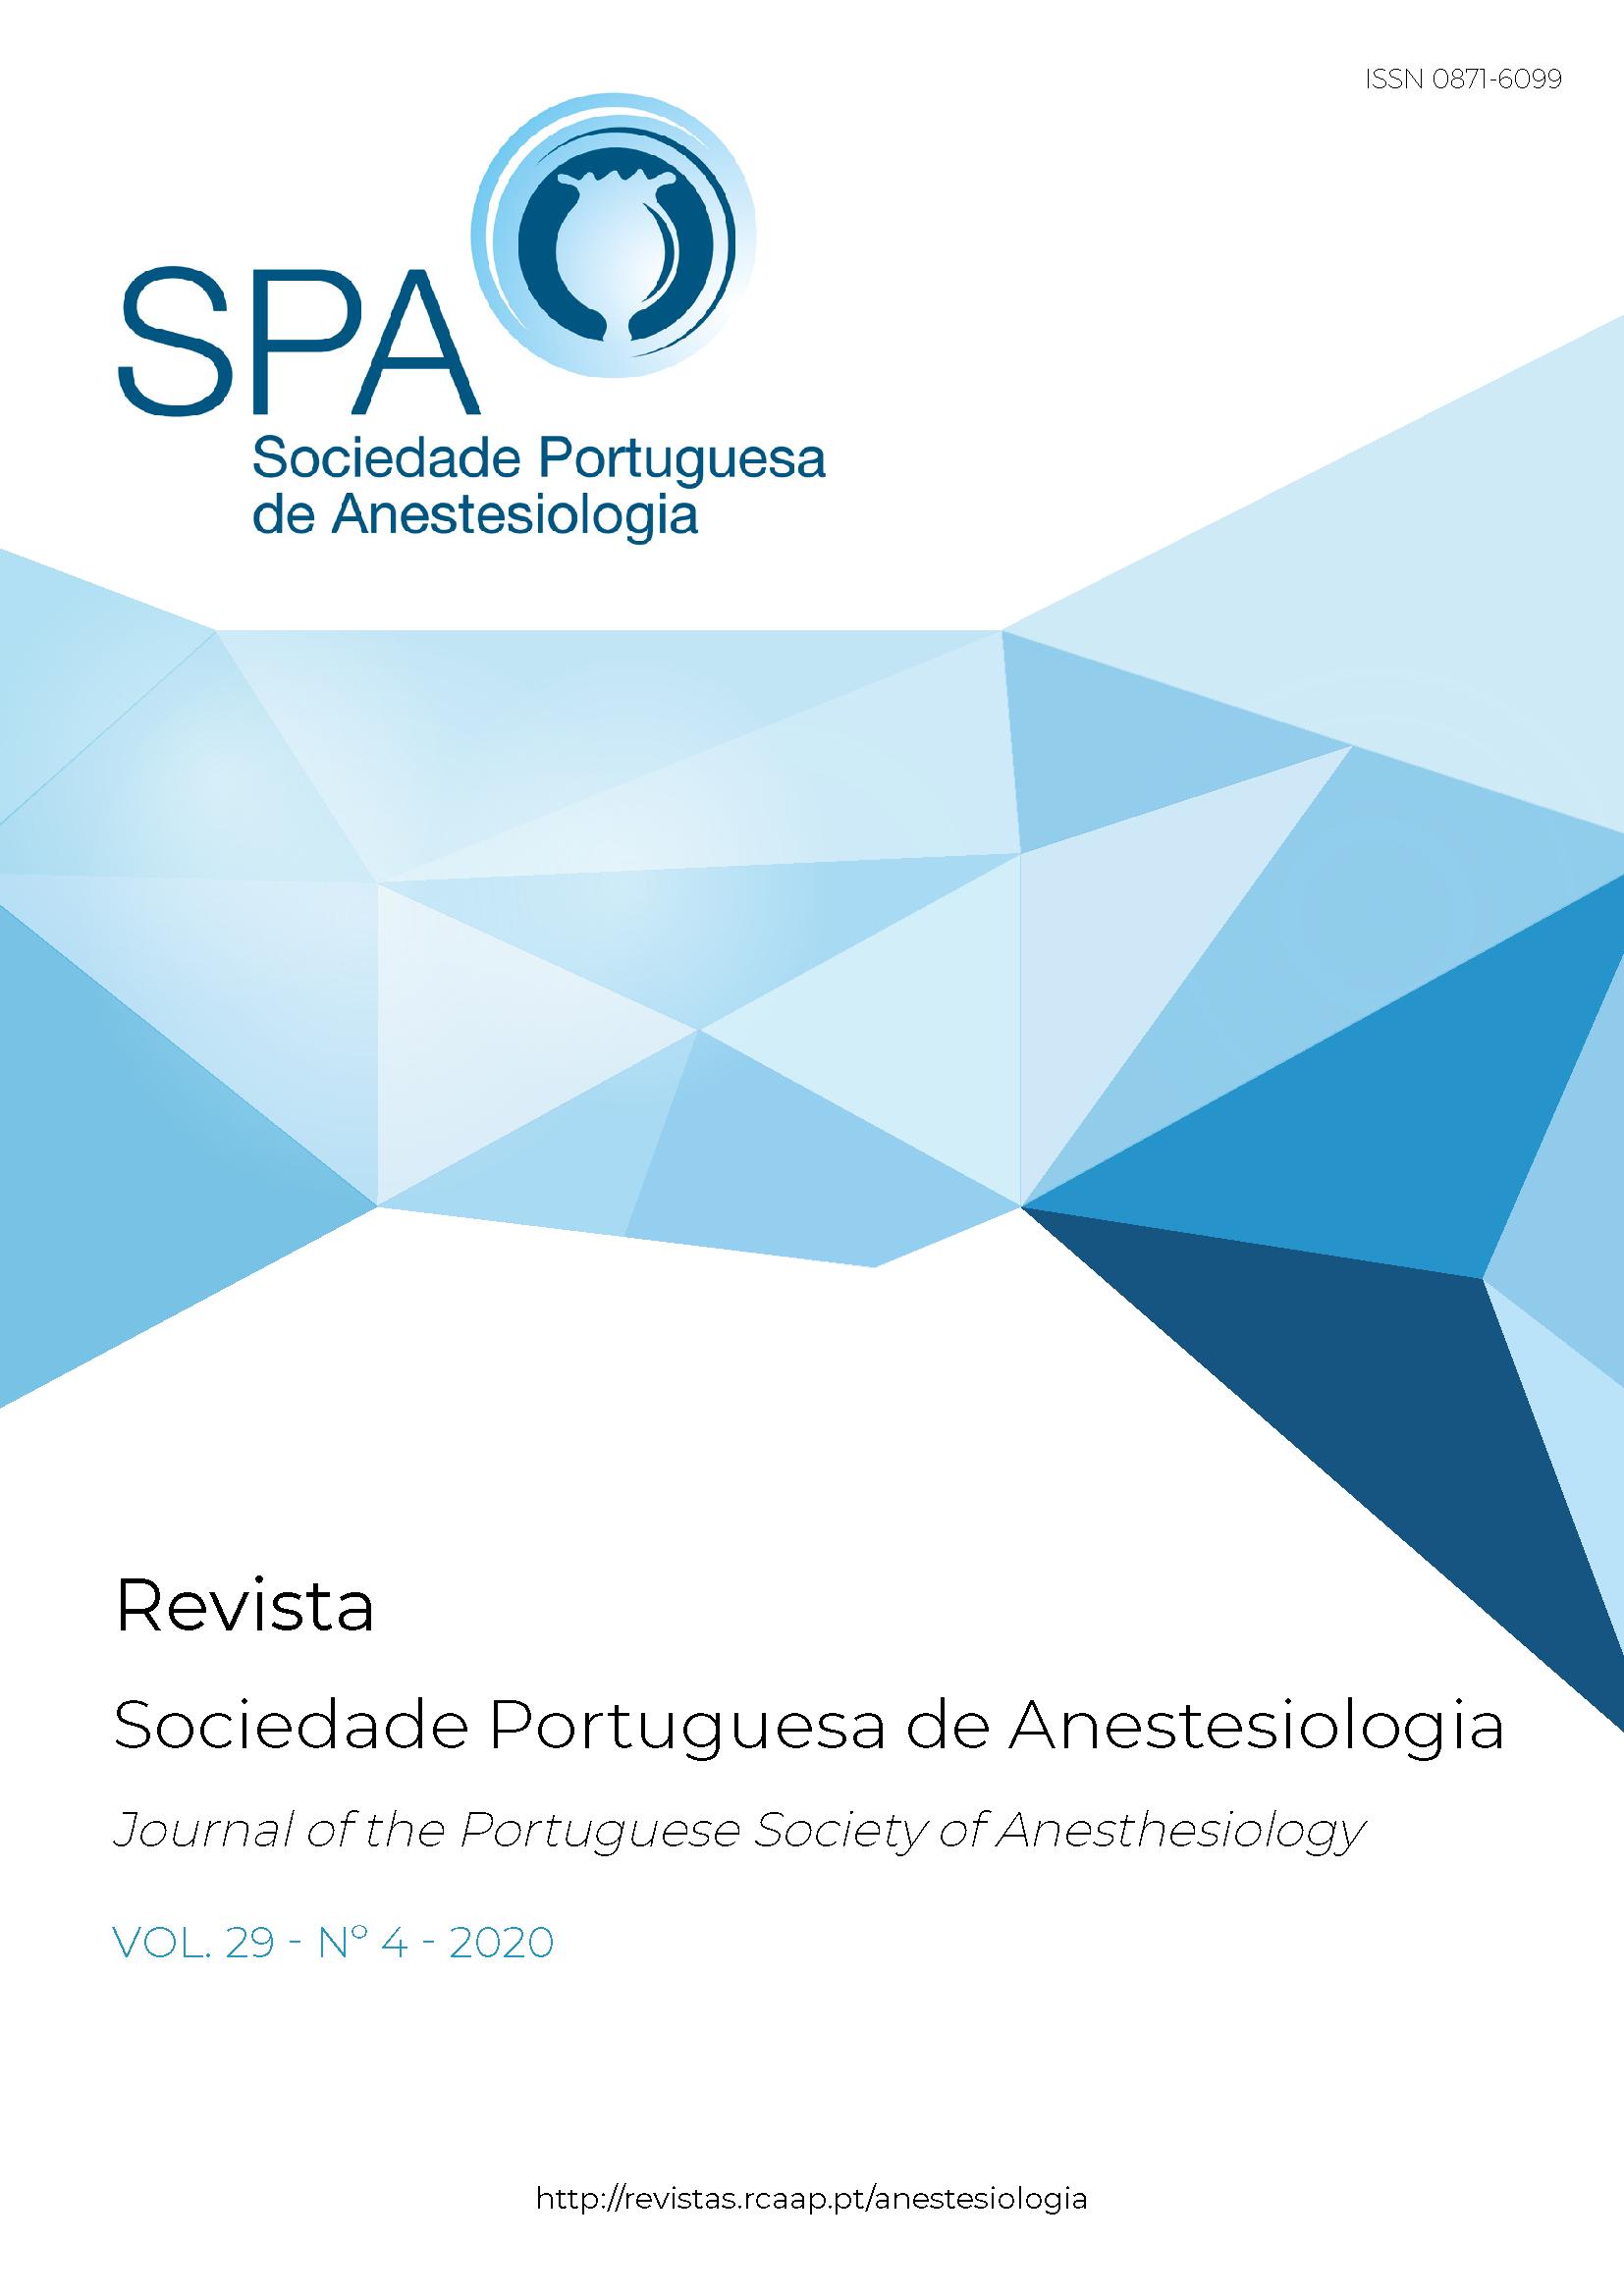 Ver Vol. 29 N.º 4 (2020): Revista da Sociedade Portuguesa de Anestesiologia